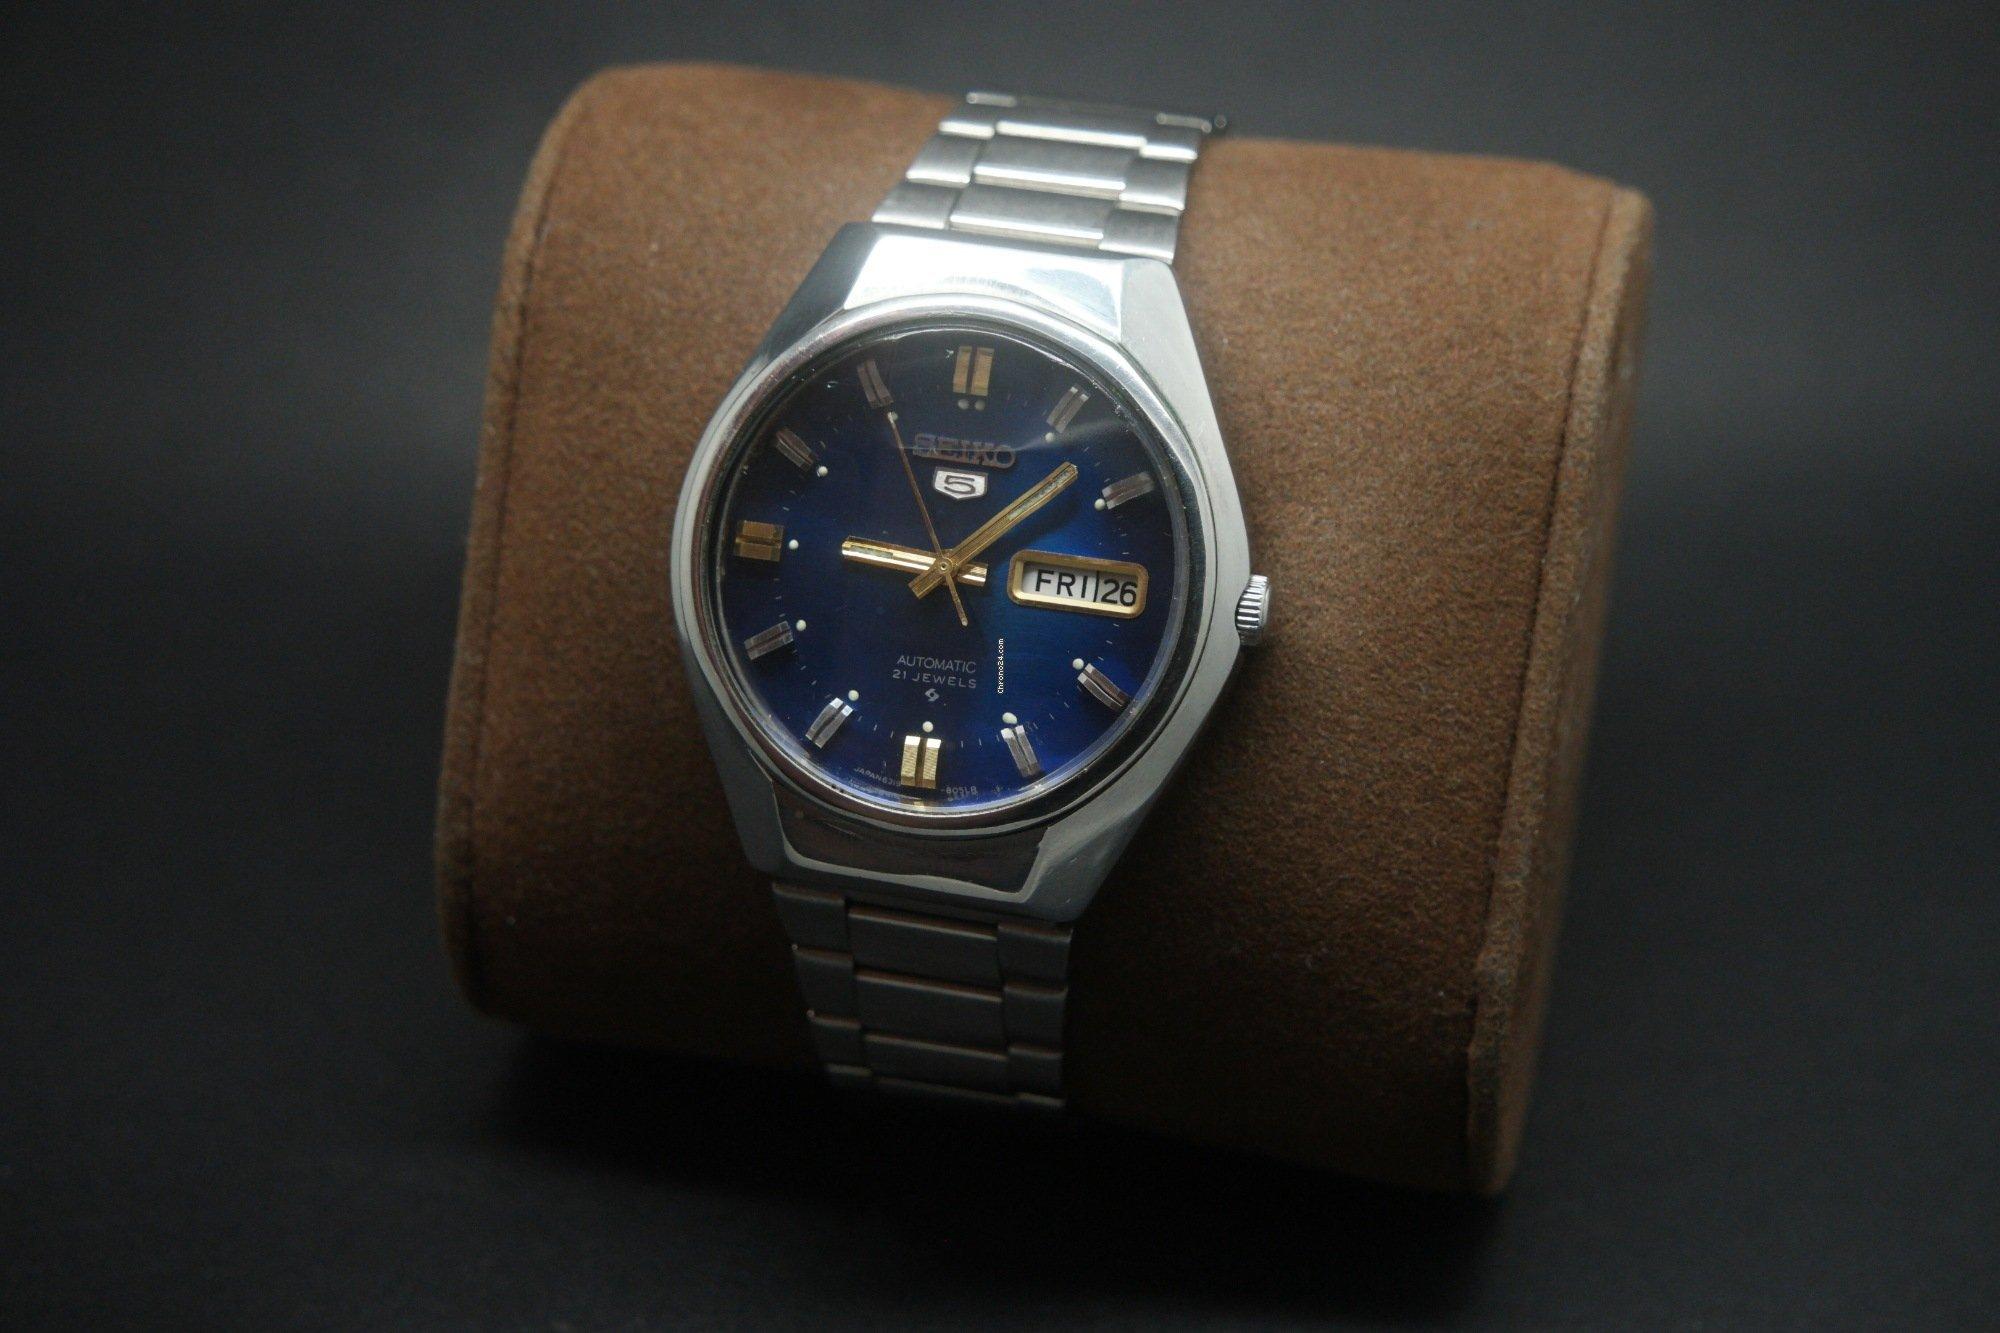 Seiko Vintage Seiko 5 Automatic Day Date 21 Jewels Watch